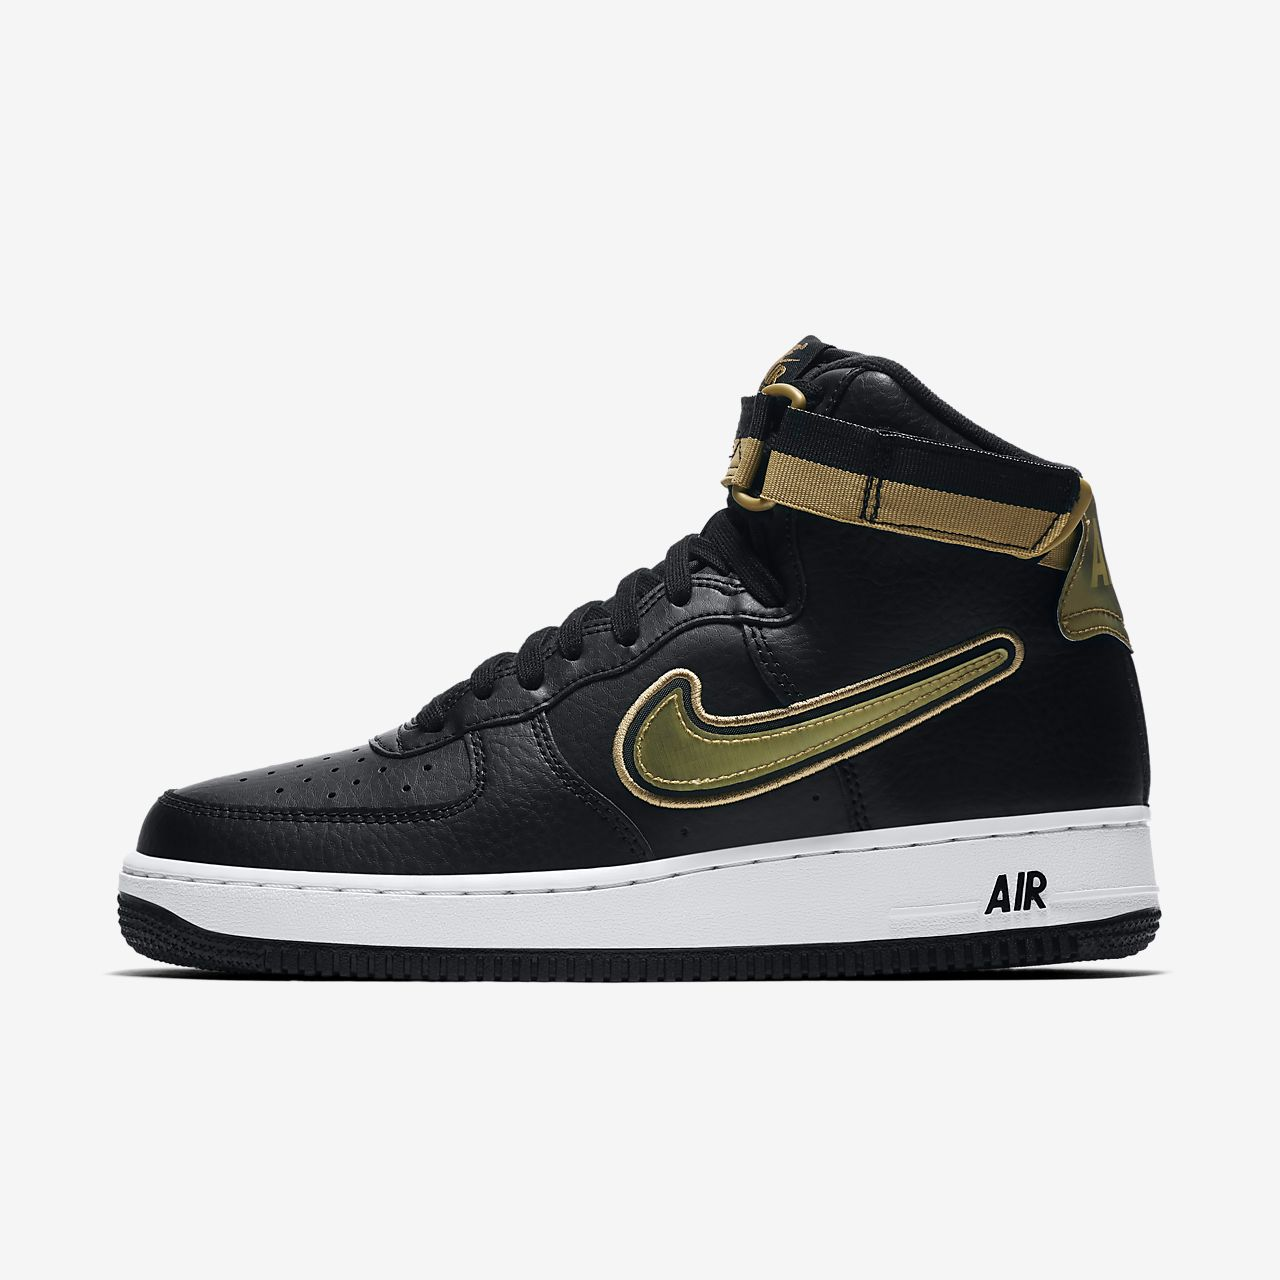 d14e6b9780eb Buty męskie Nike Air Force 1 High  07 LV8 Sport NBA. Nike.com PL